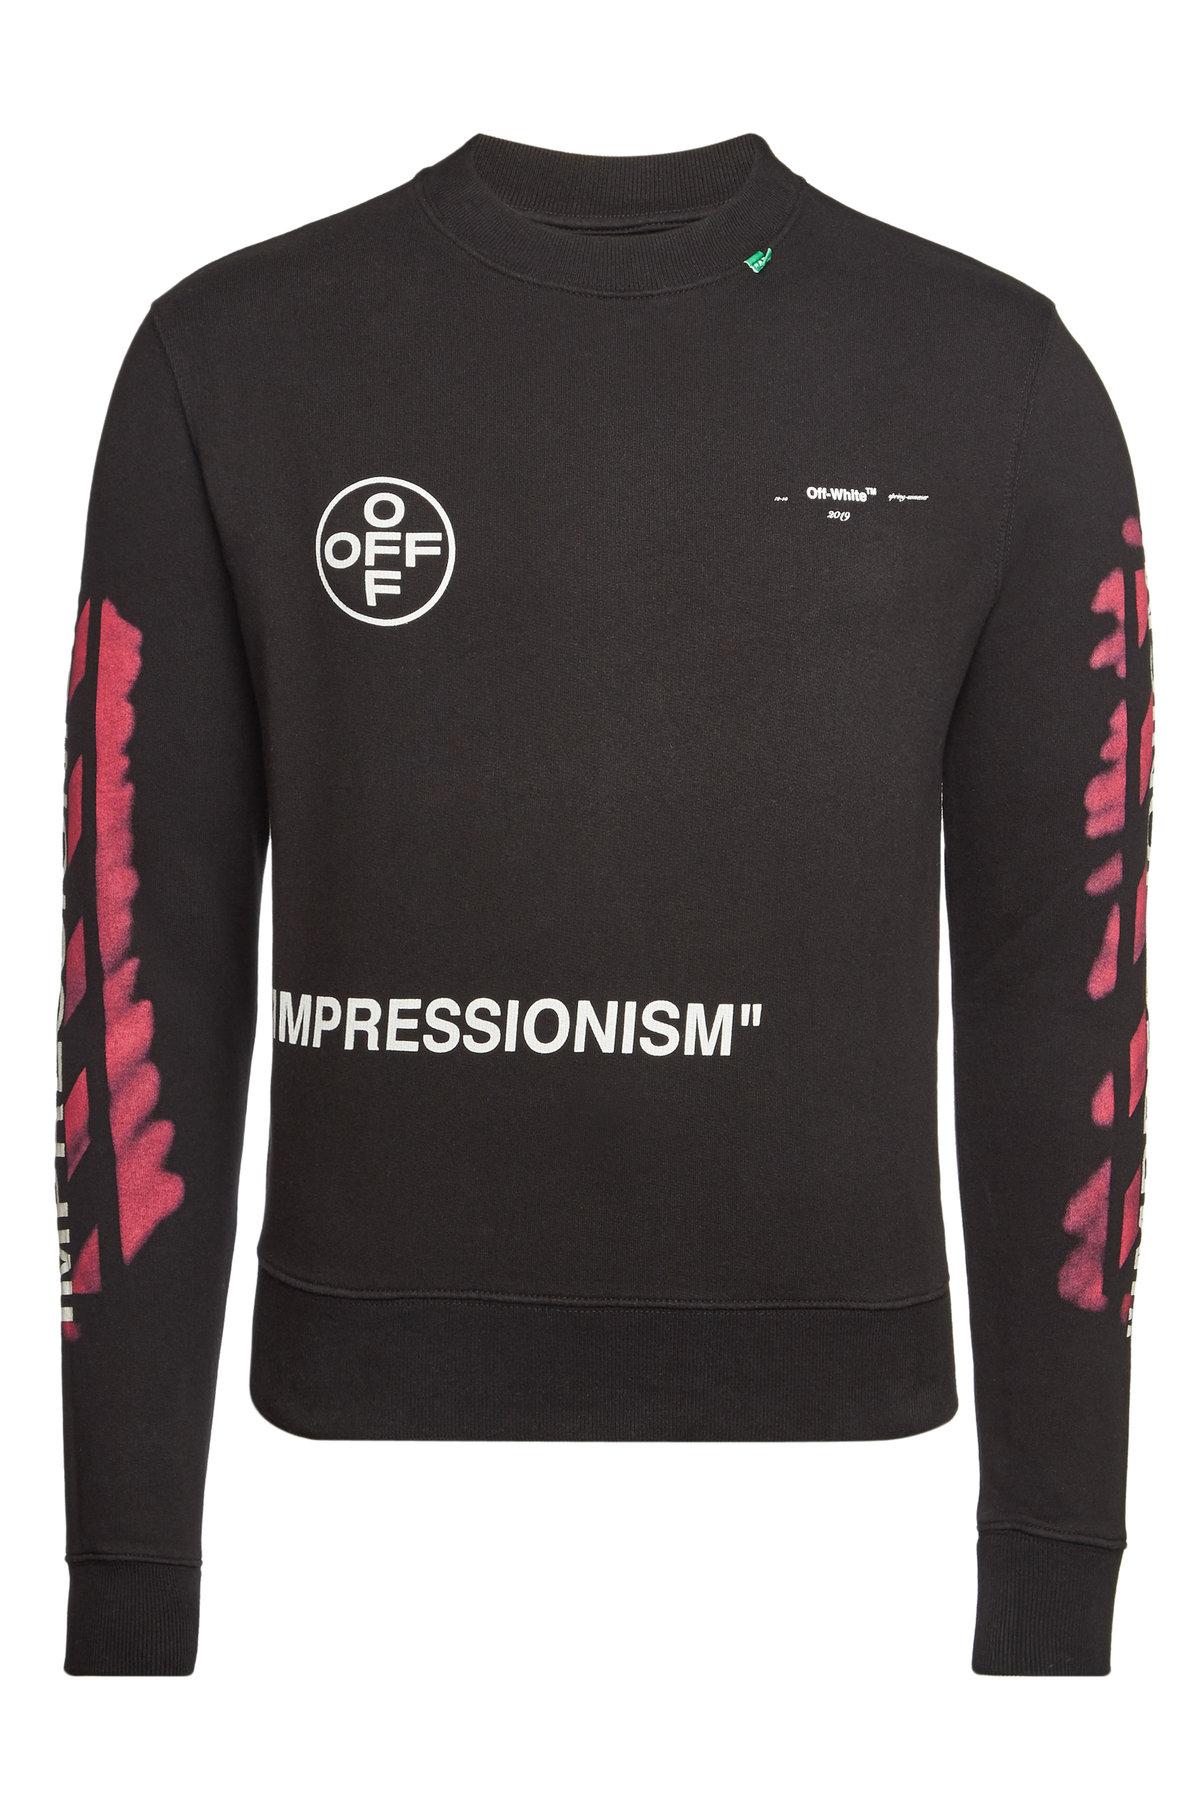 a09f1276add Off-White Cotton Diagonal Stencil Slim Crewneck Sweatshirt In Black ...